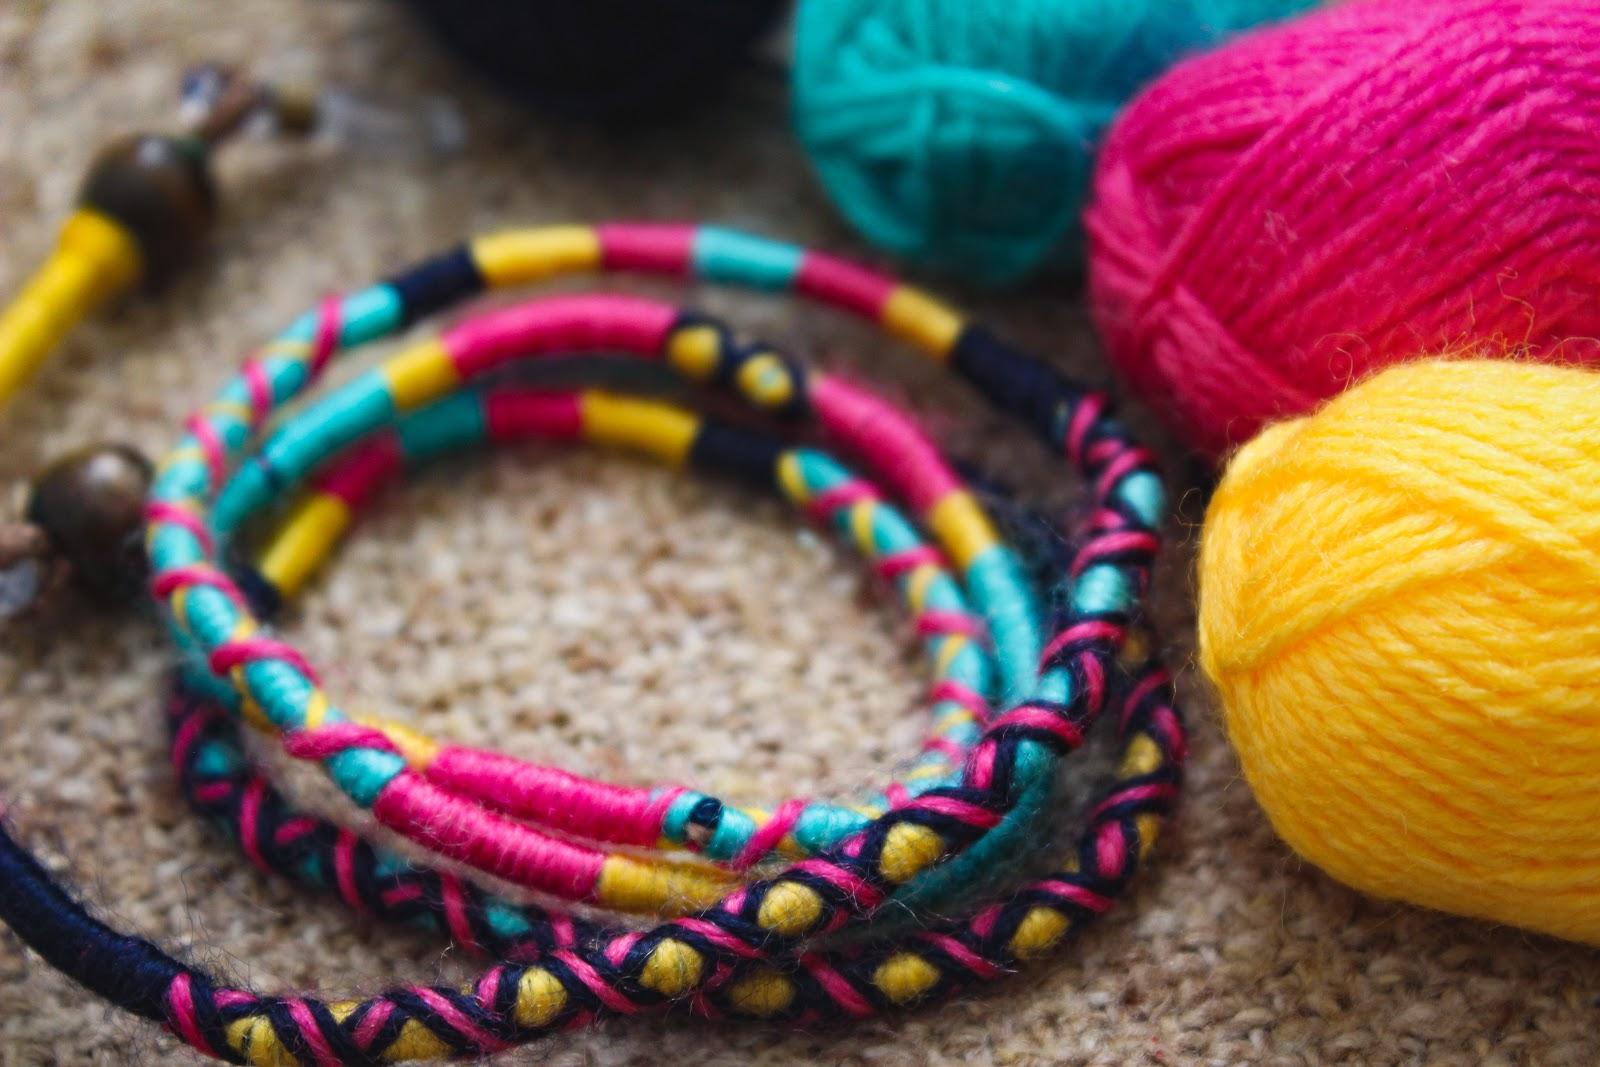 balls of yarn around a piece of jewelry handmade with yarn